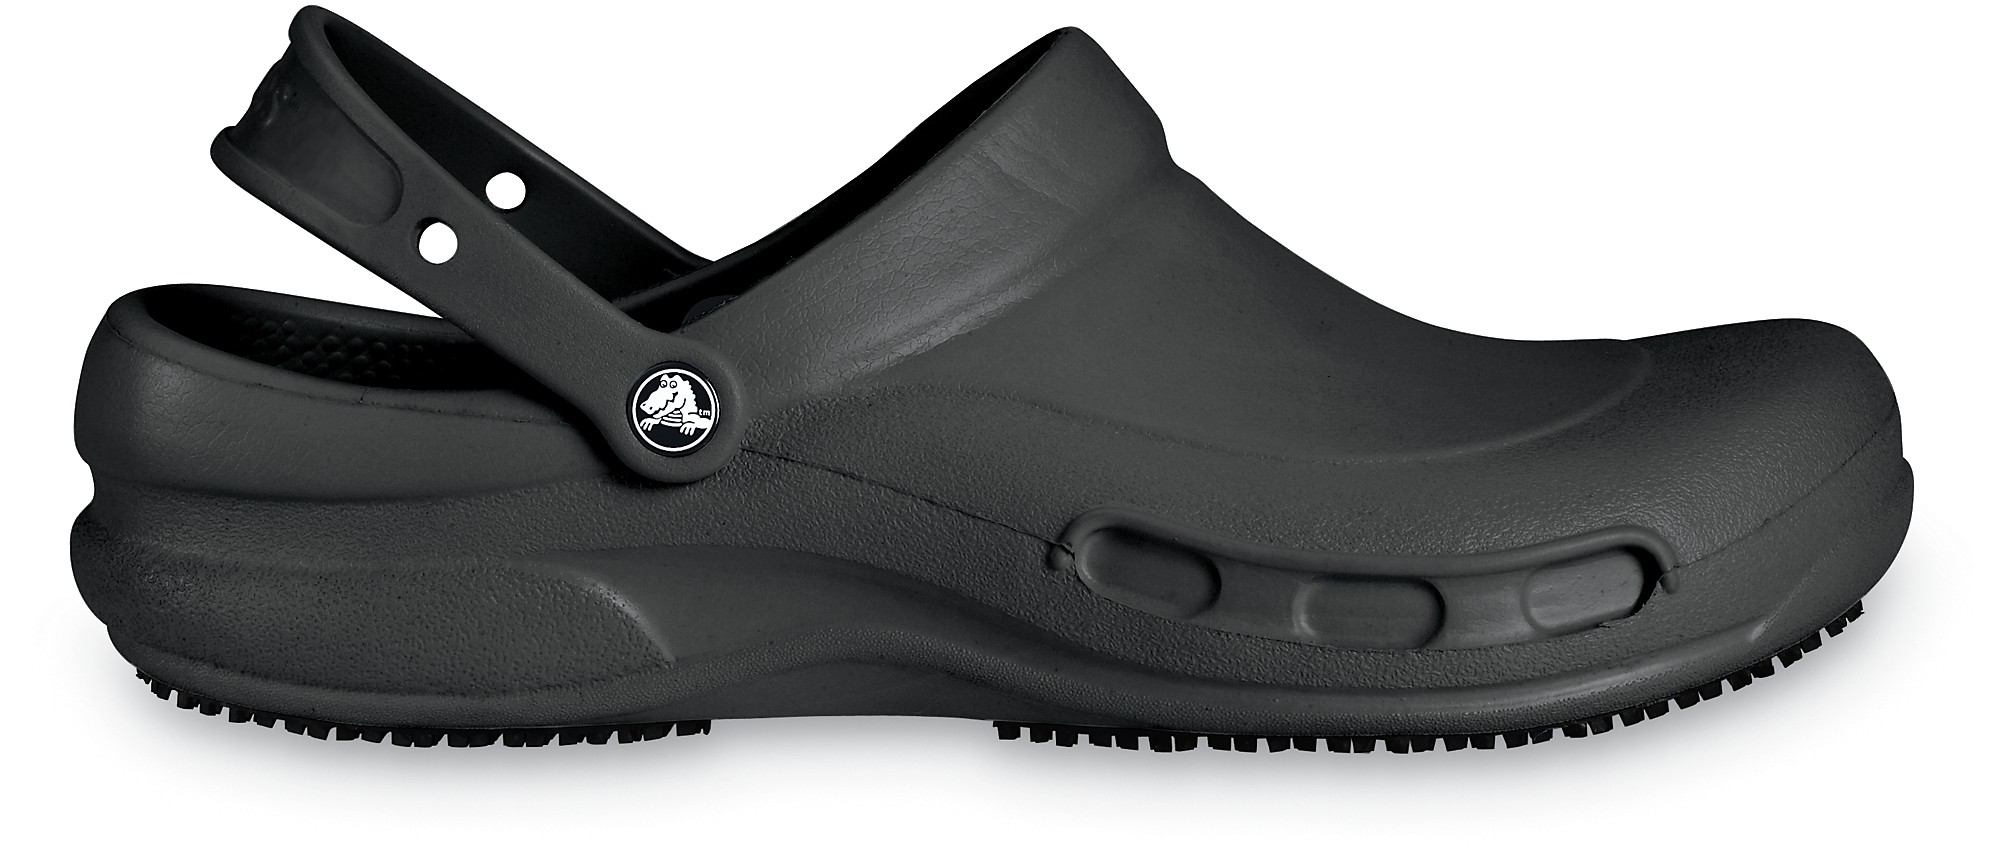 Crocs Bistro Black by NurseOClock for €49.95 on kitchen cat, kitchen shoes, kitchen clogs,